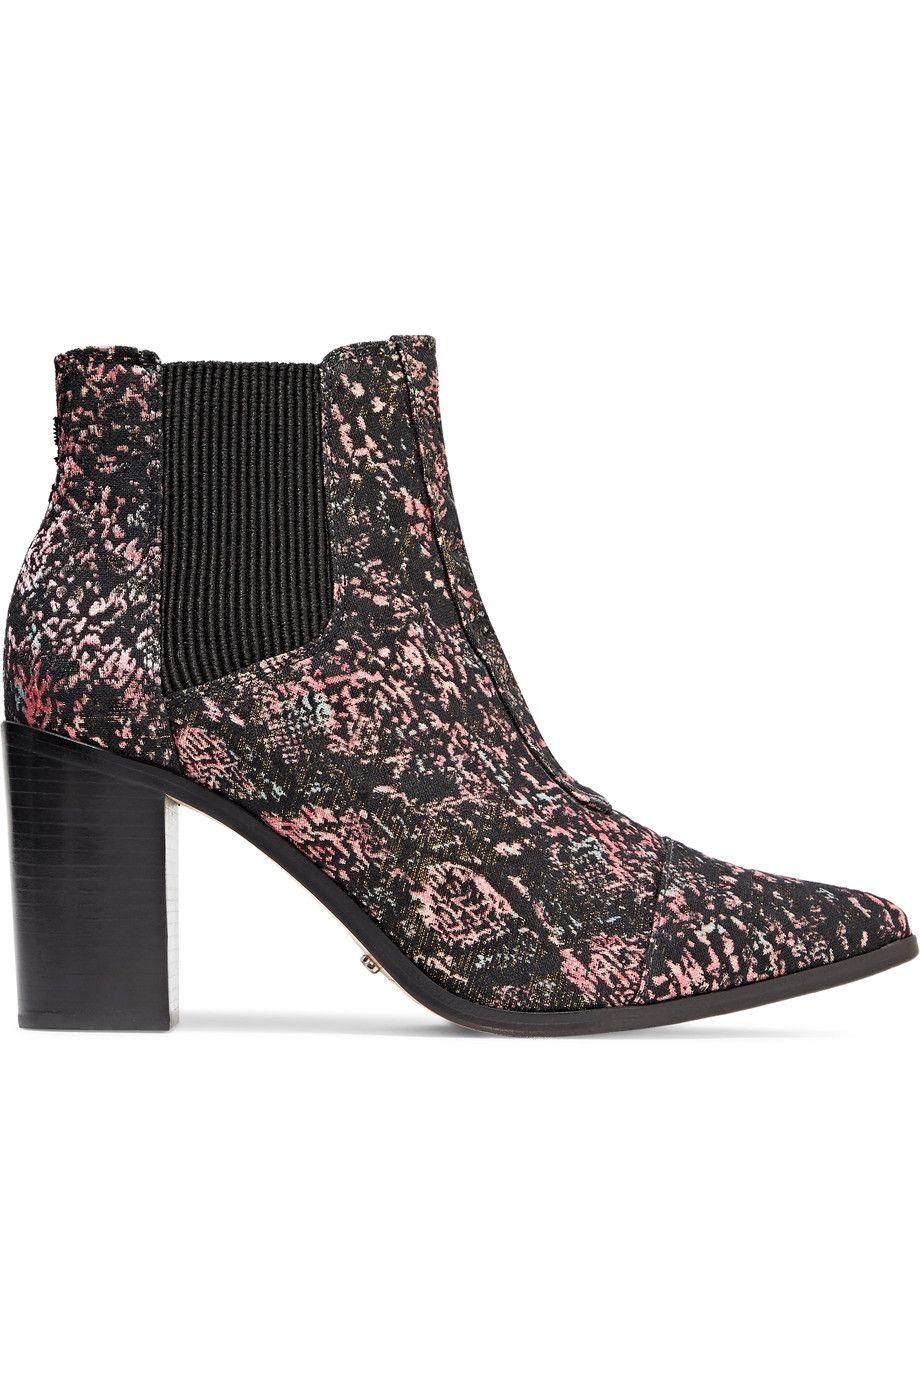 937e402bc SCHUTZ Hapiness metallic jacquard ankle boots. #schutz #shoes ...